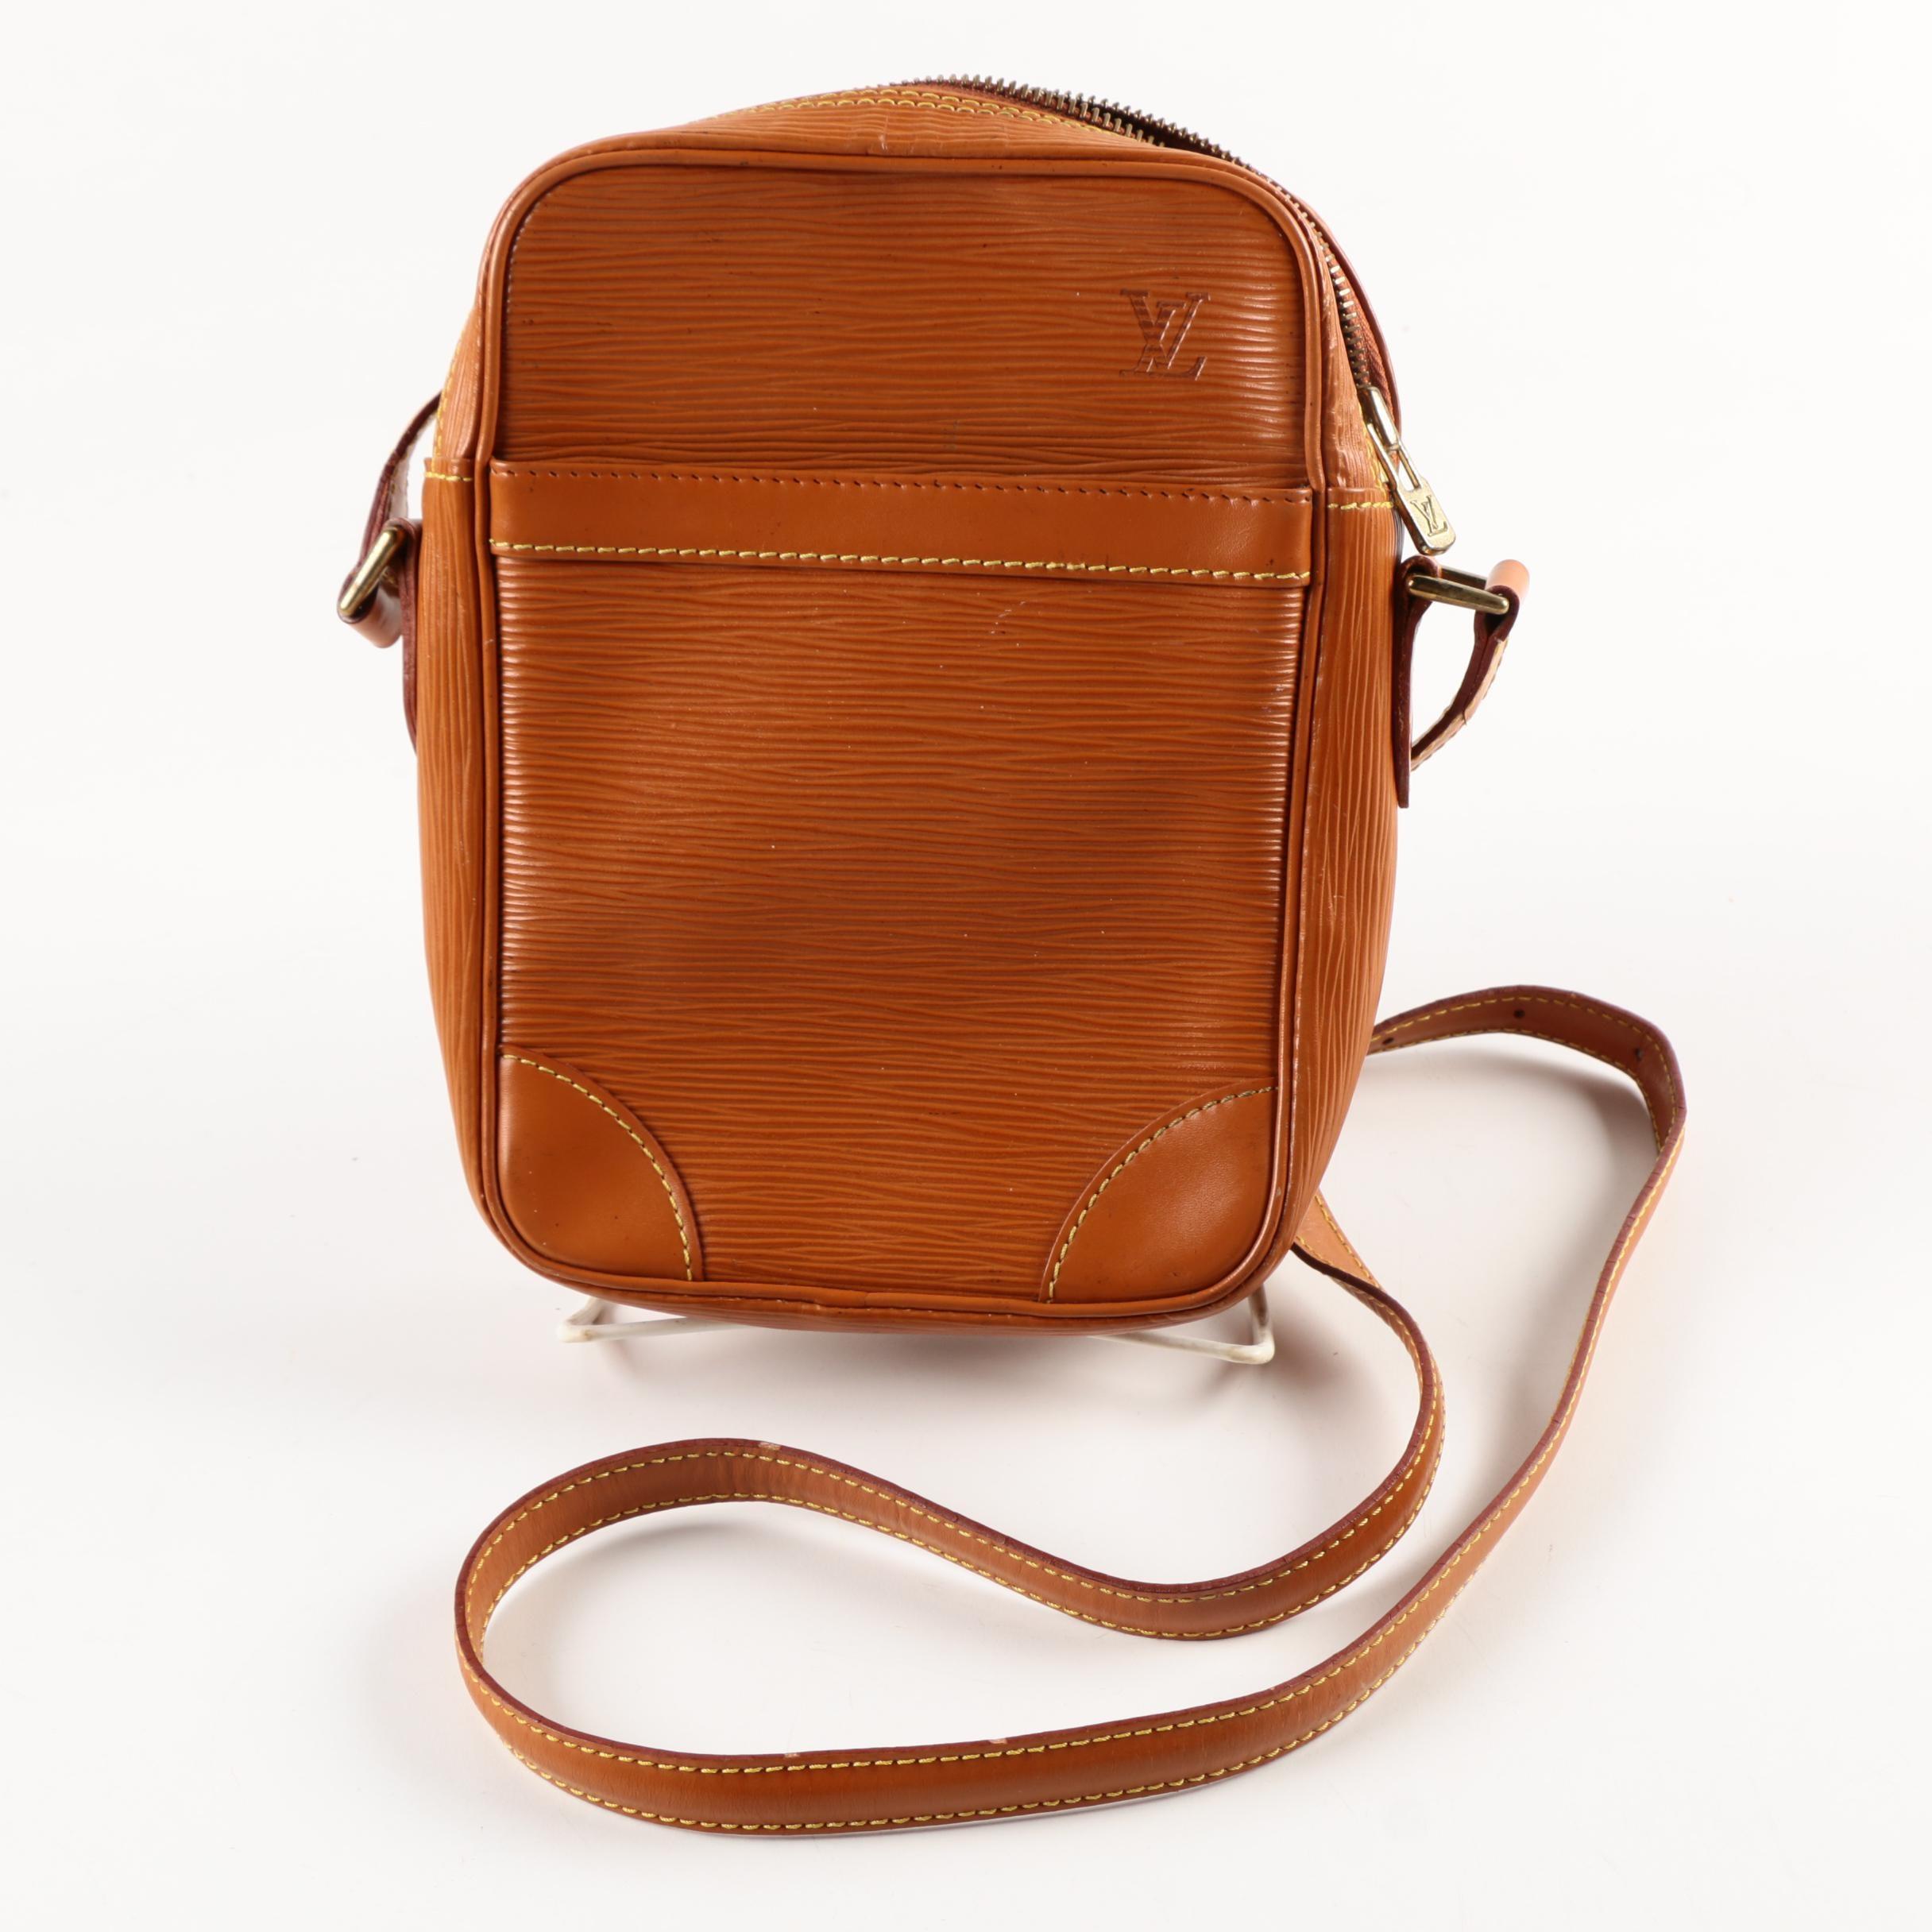 Louis Vuitton Danube Epi Leather Purse